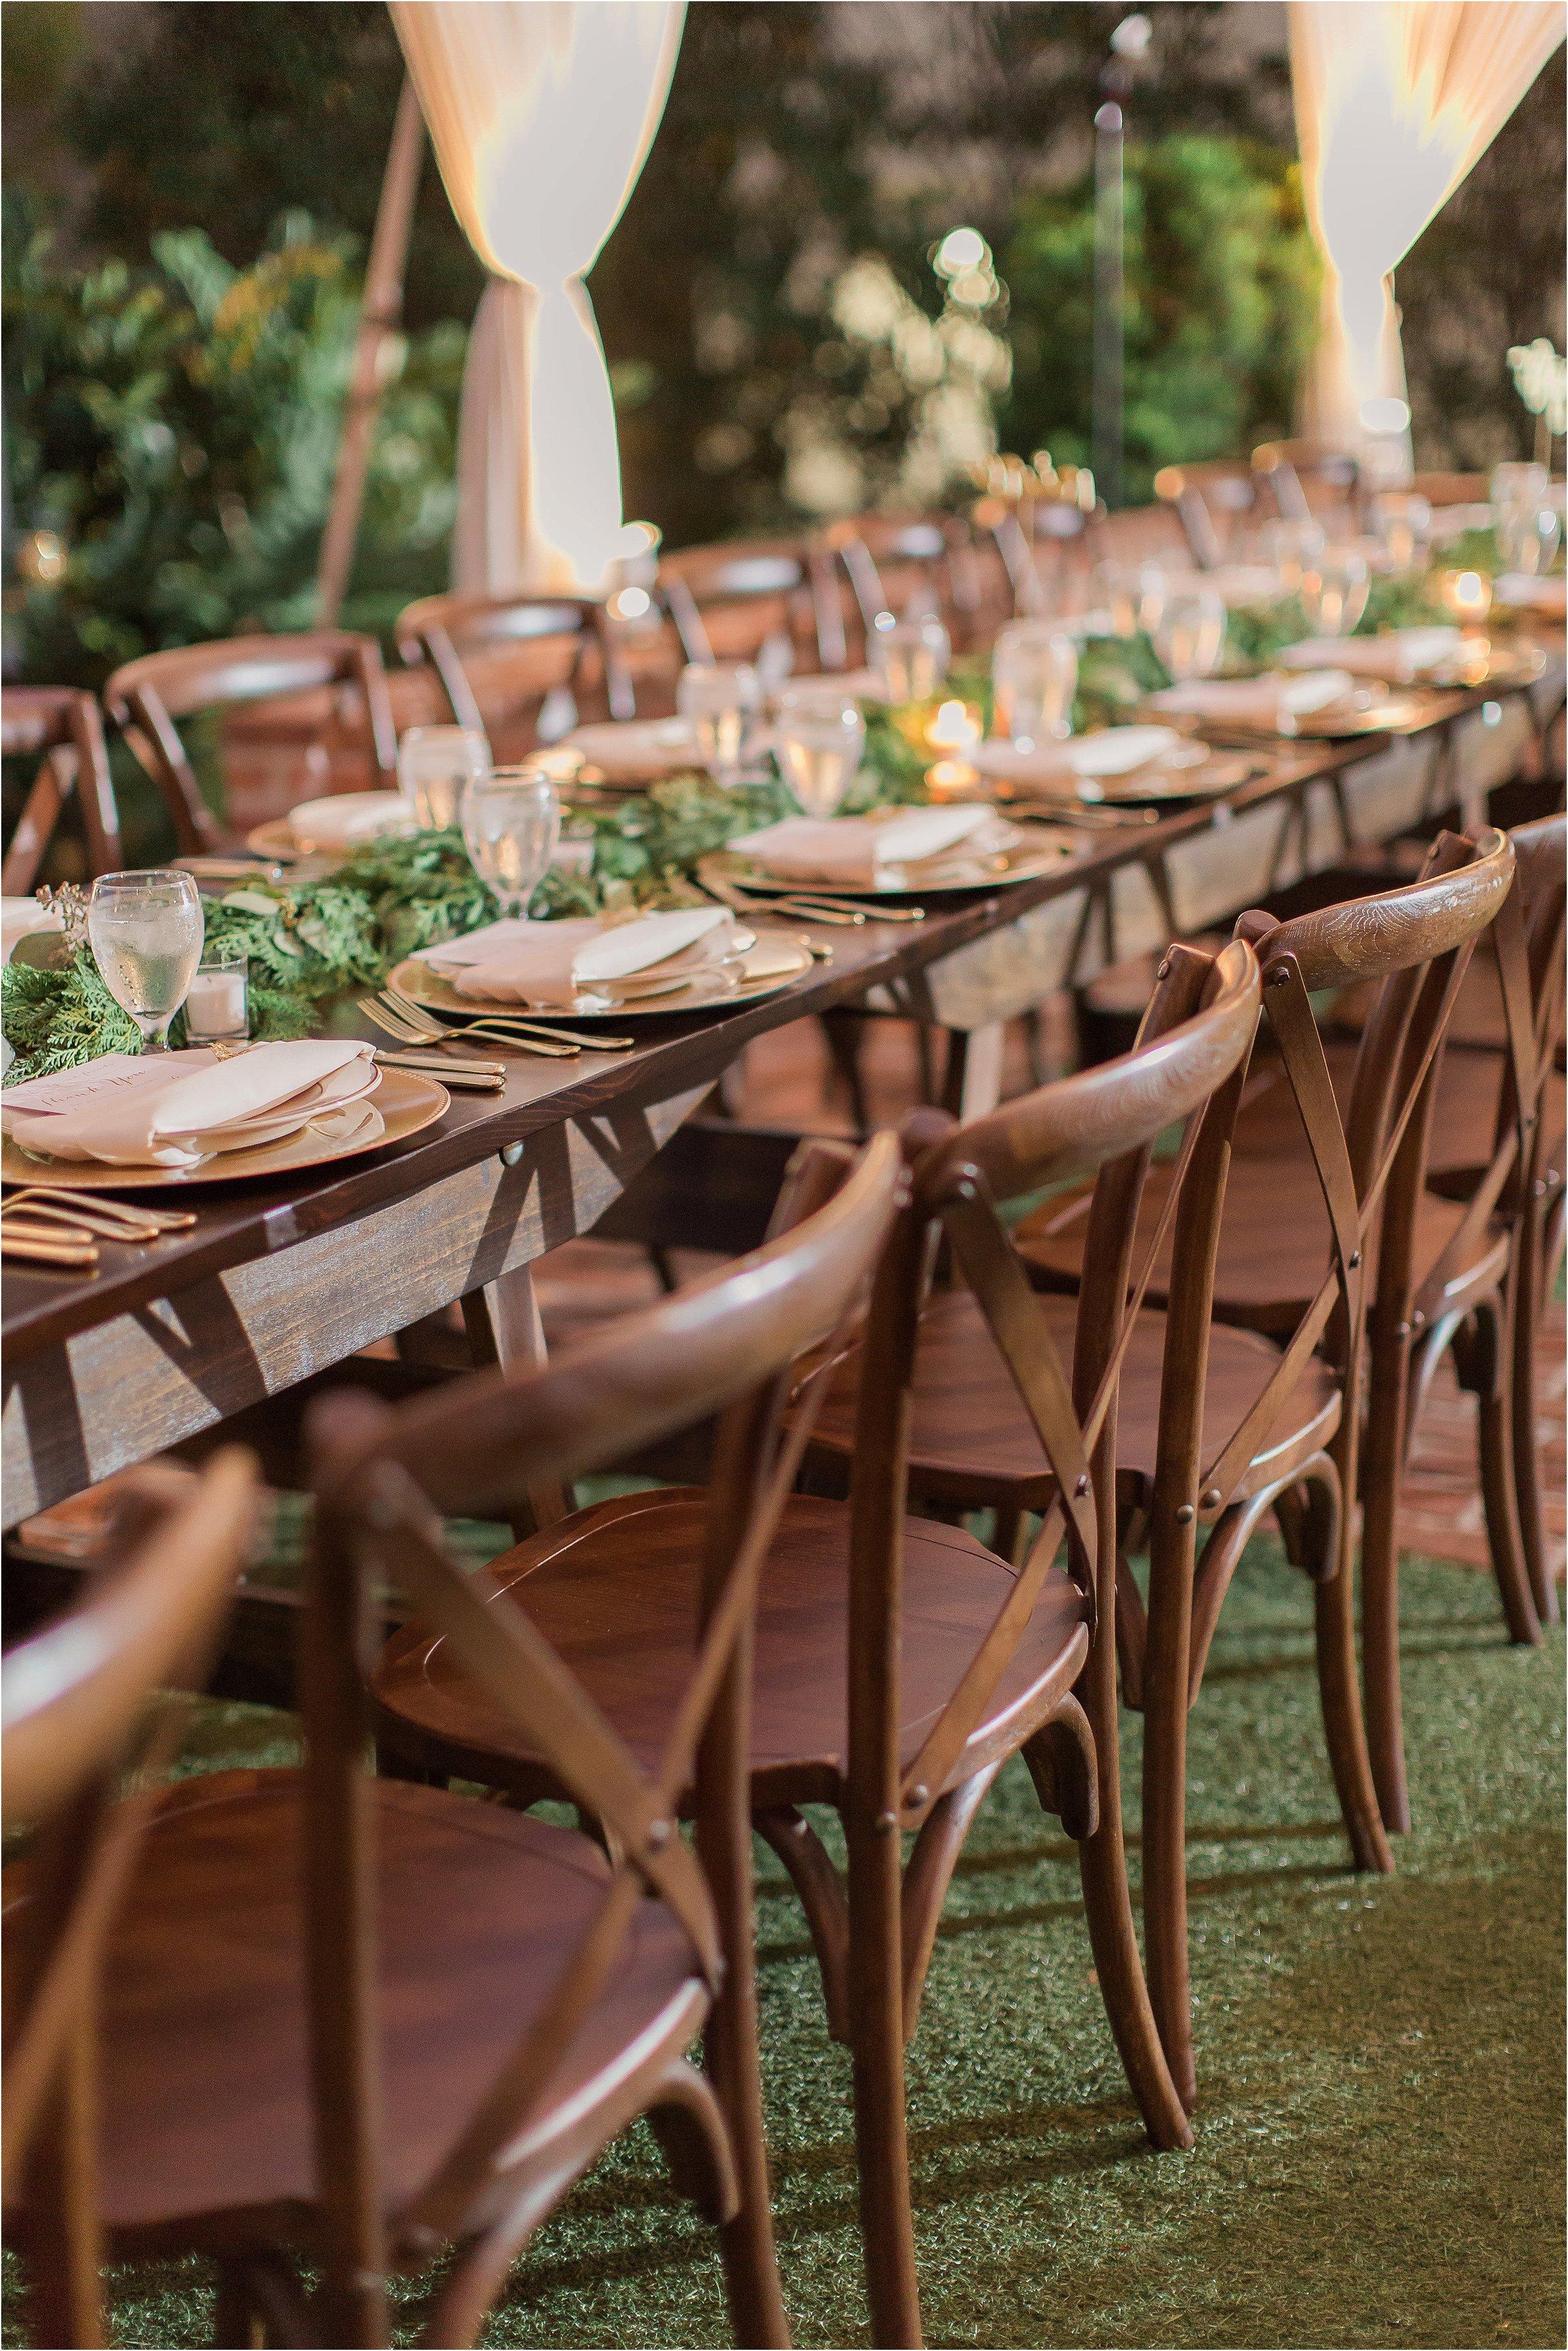 Casa_Feliz_Alfond_Inn_Winter_WeddingndhamGrandWedding_0100.jpg